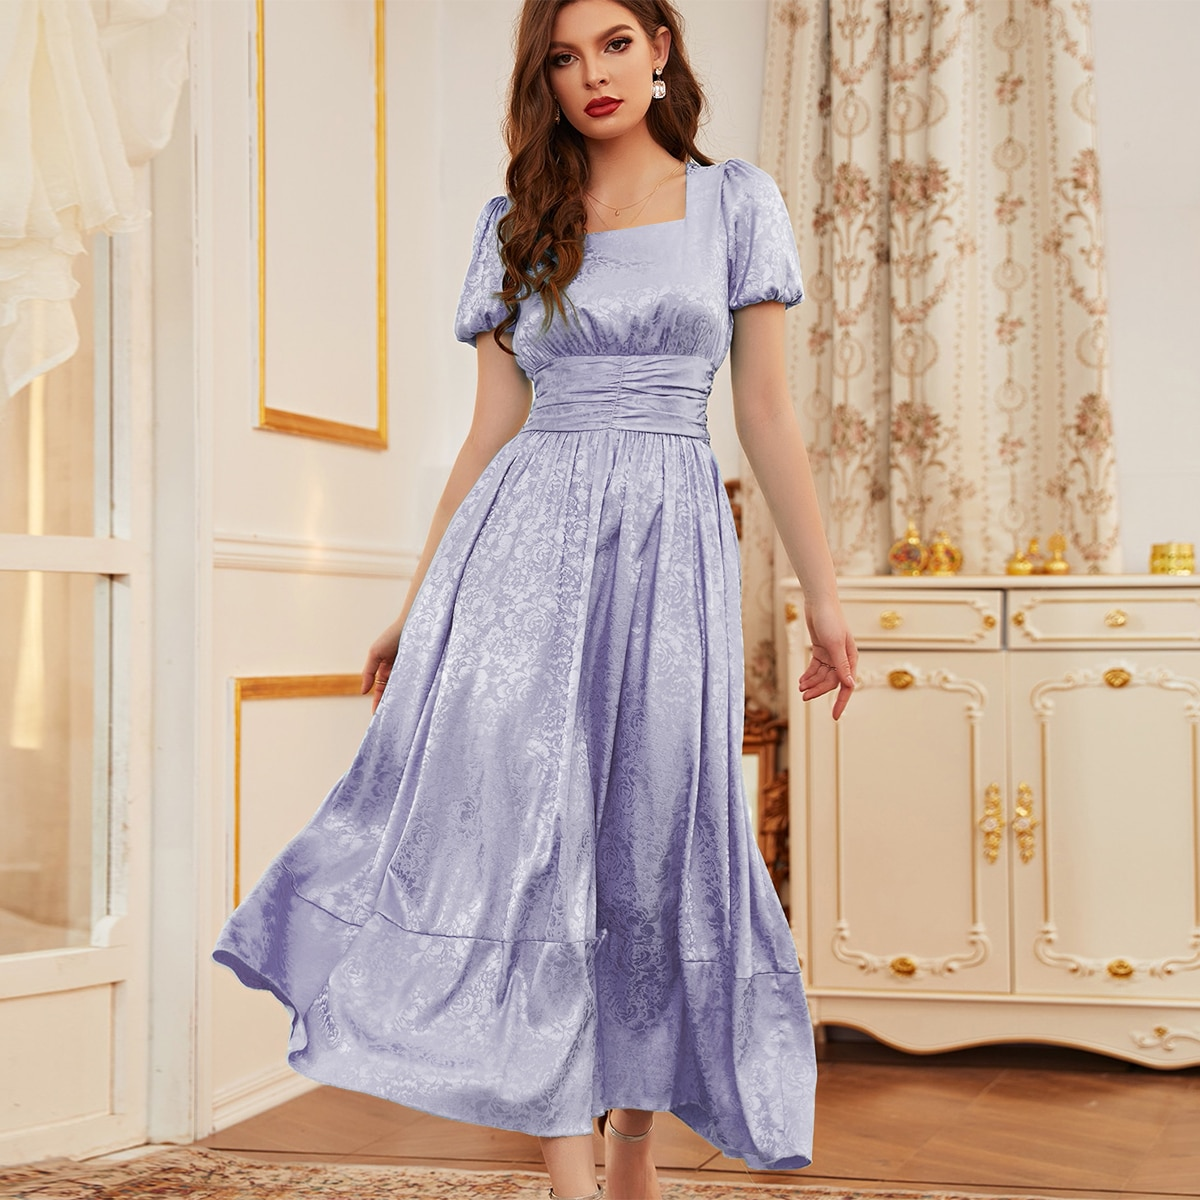 Square Neck Ruffle Hem A-line Dress